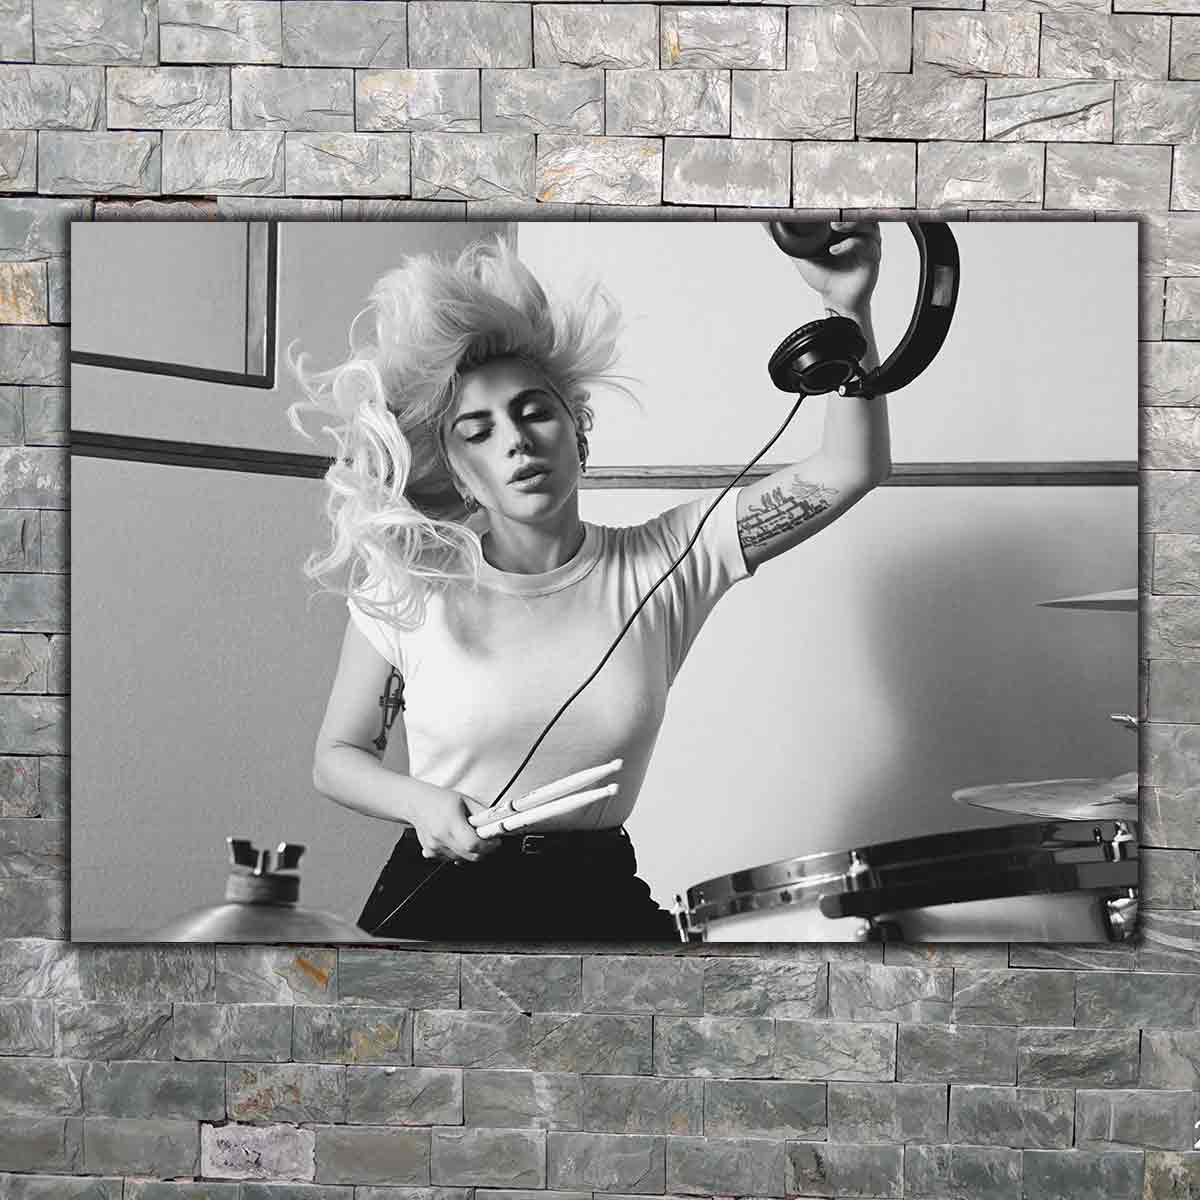 Cartel de arte impreso caliente decoración de pared del hogar 8x12 12x18 24x36decor lona LADY GAGA Joanne 2017 música de gira mundial estrella caliente